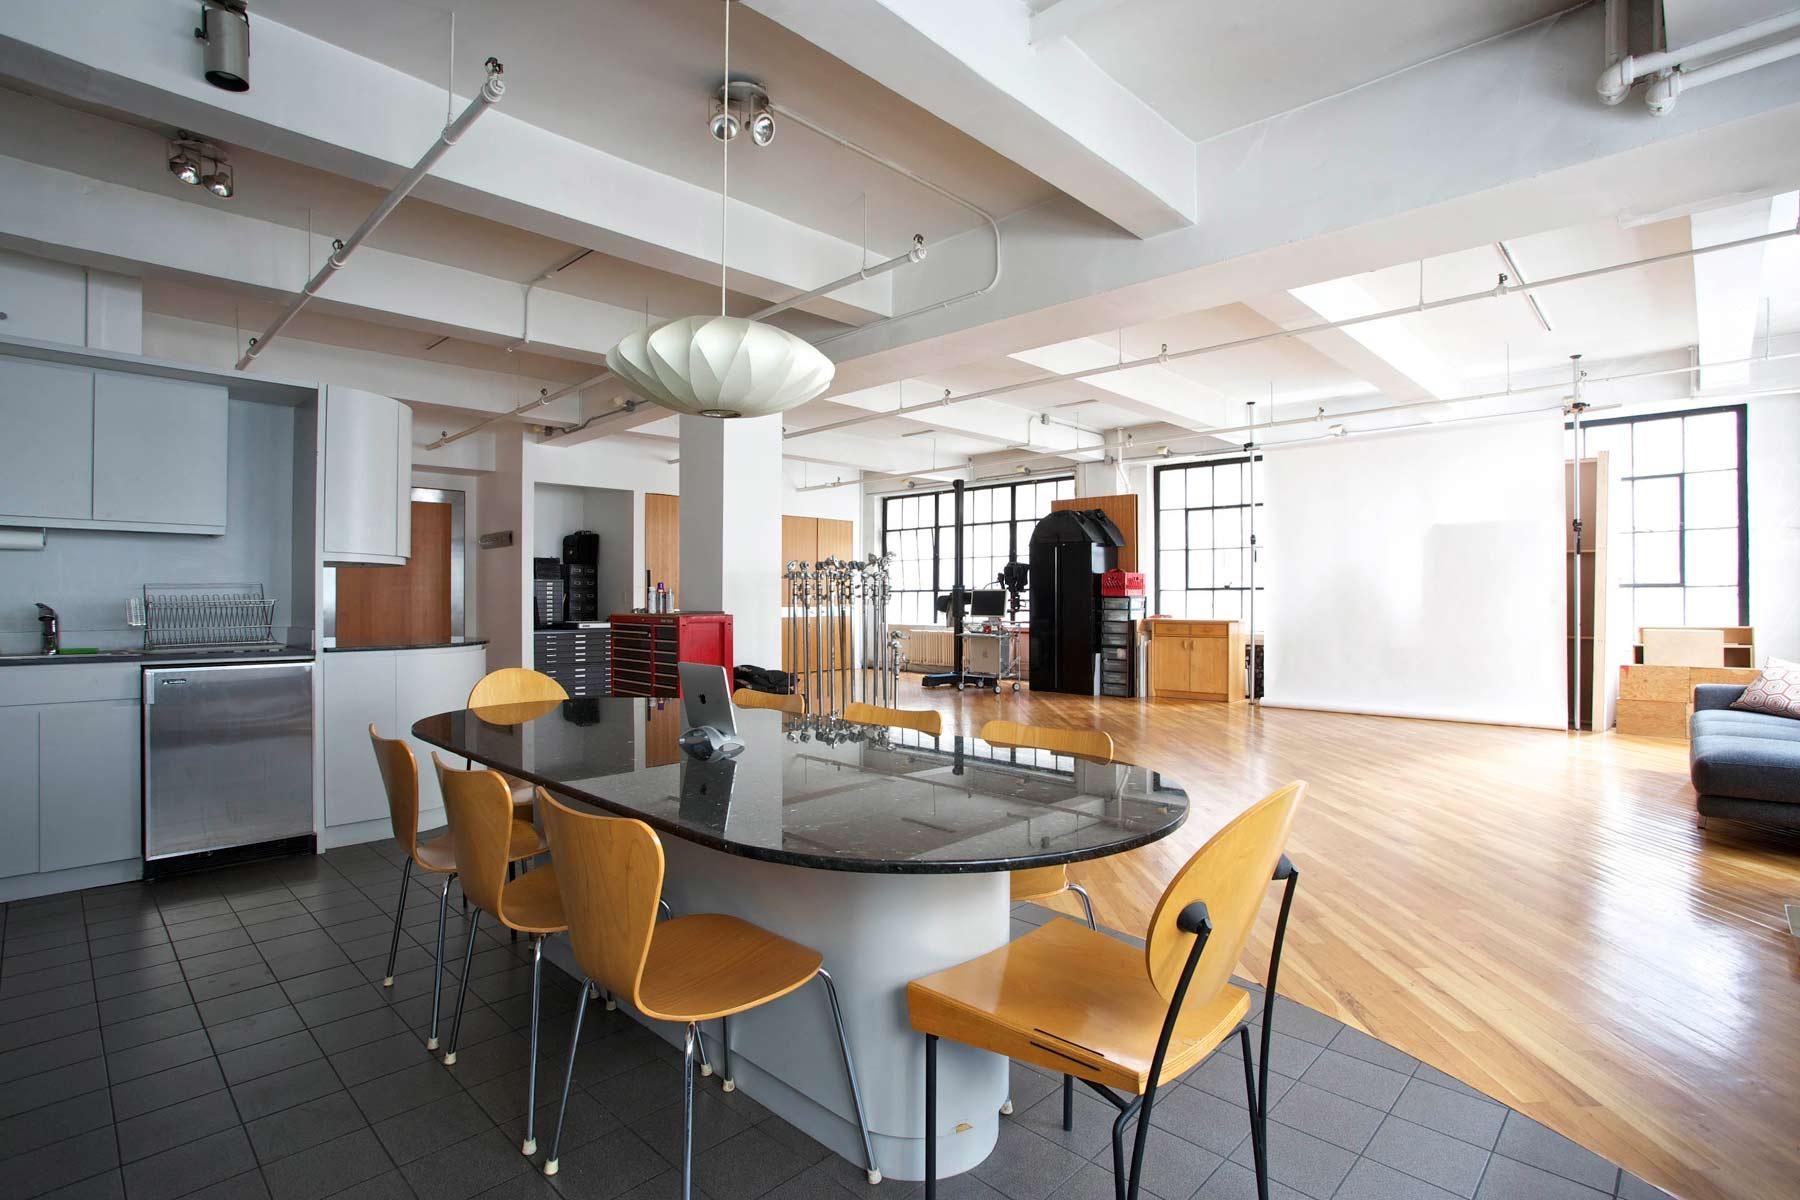 Rick Burda Photography Studio - New York City 4